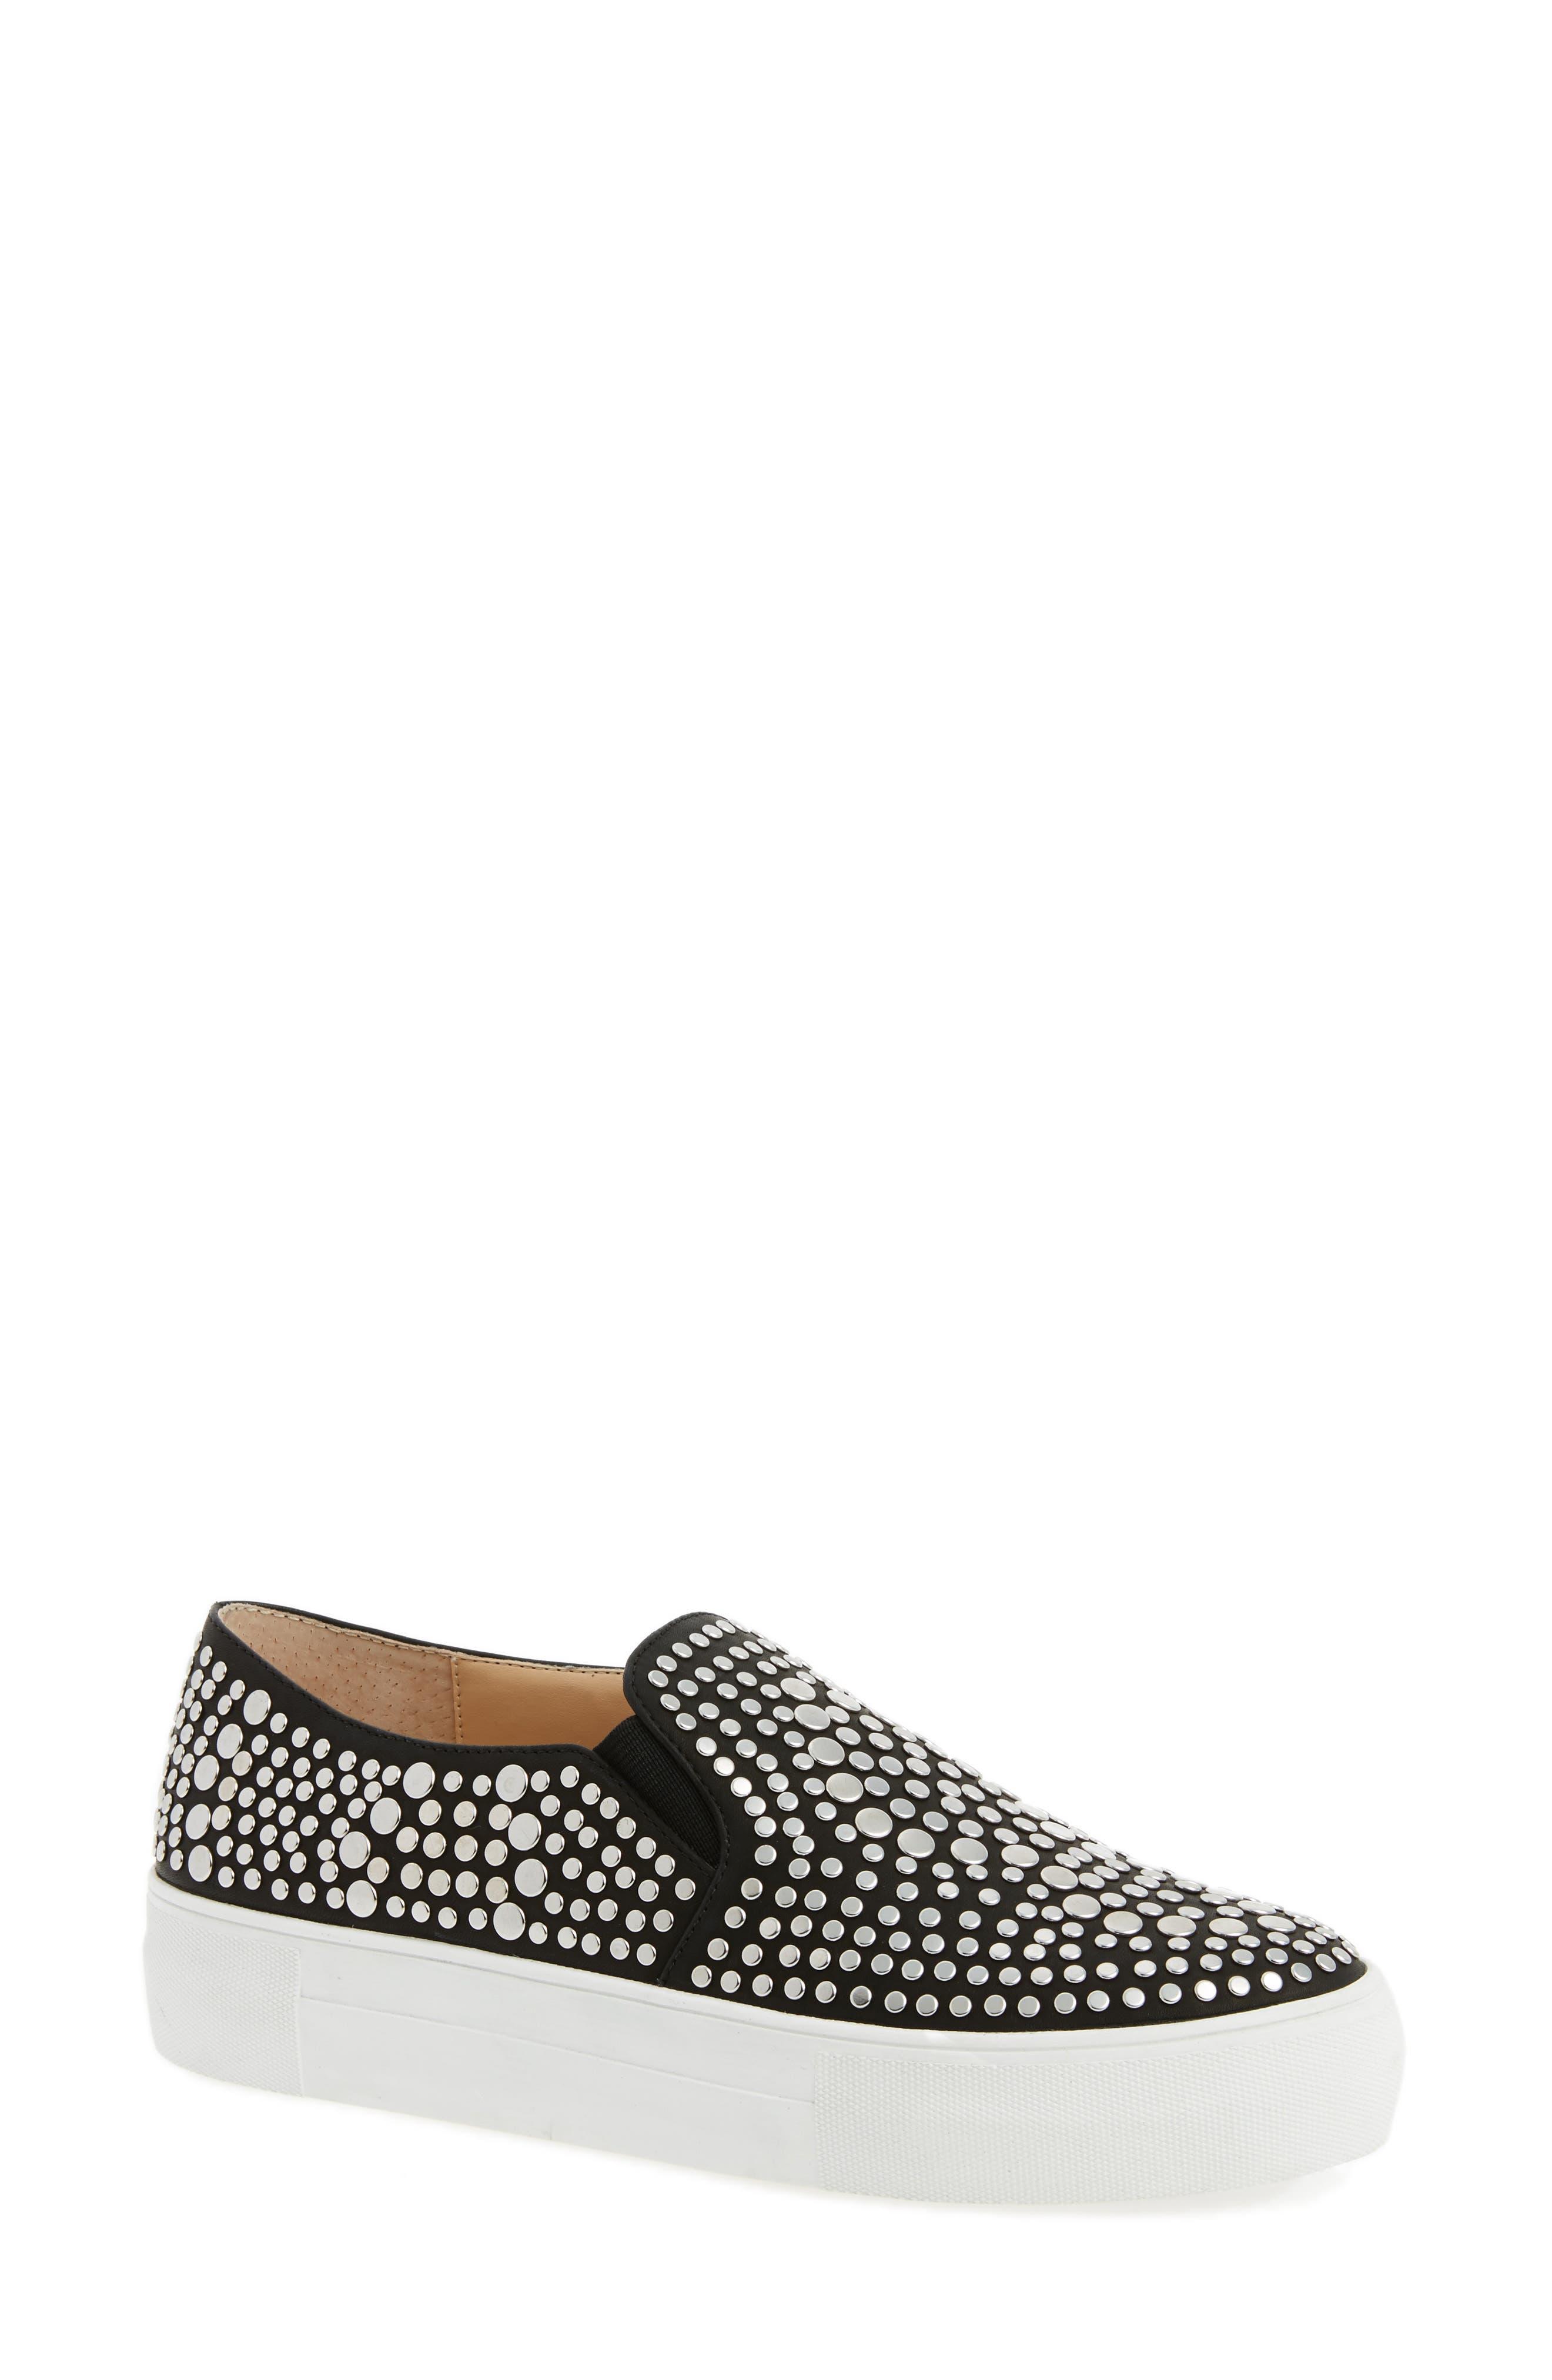 Main Image - Vince Camuto Kindra Studded Slip-On Sneaker (Women)